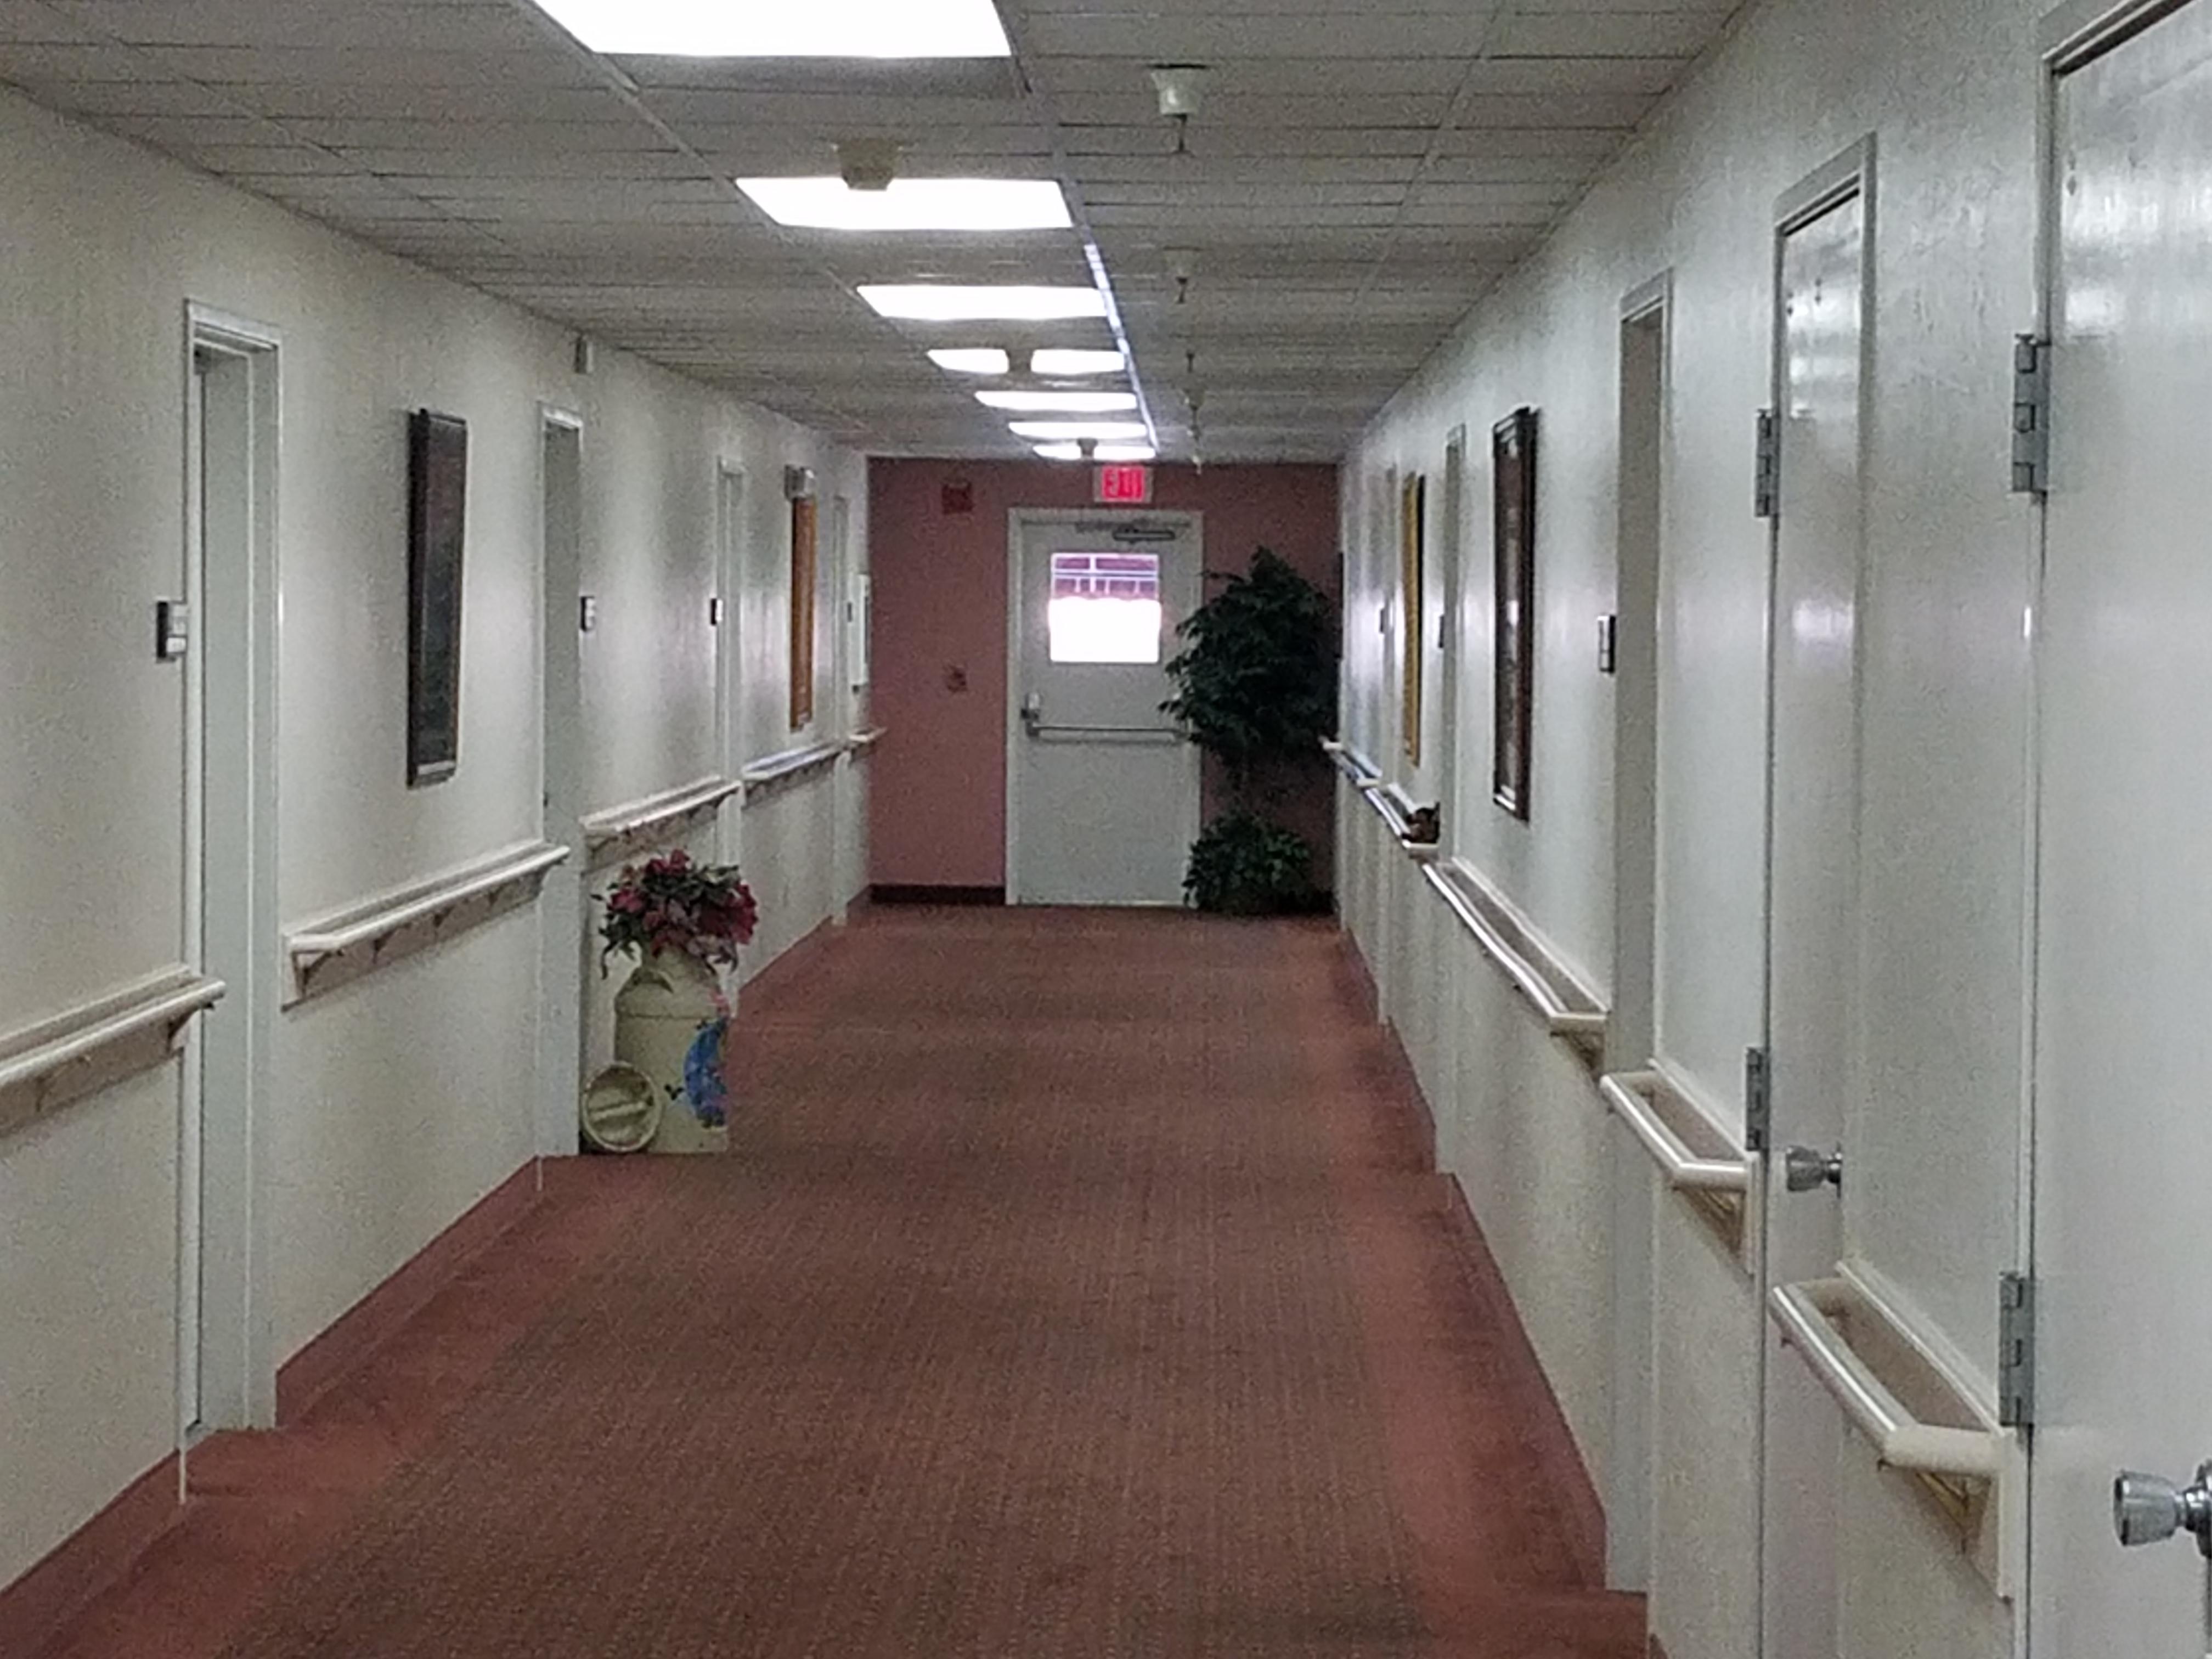 Samaritan Towers - Hallway